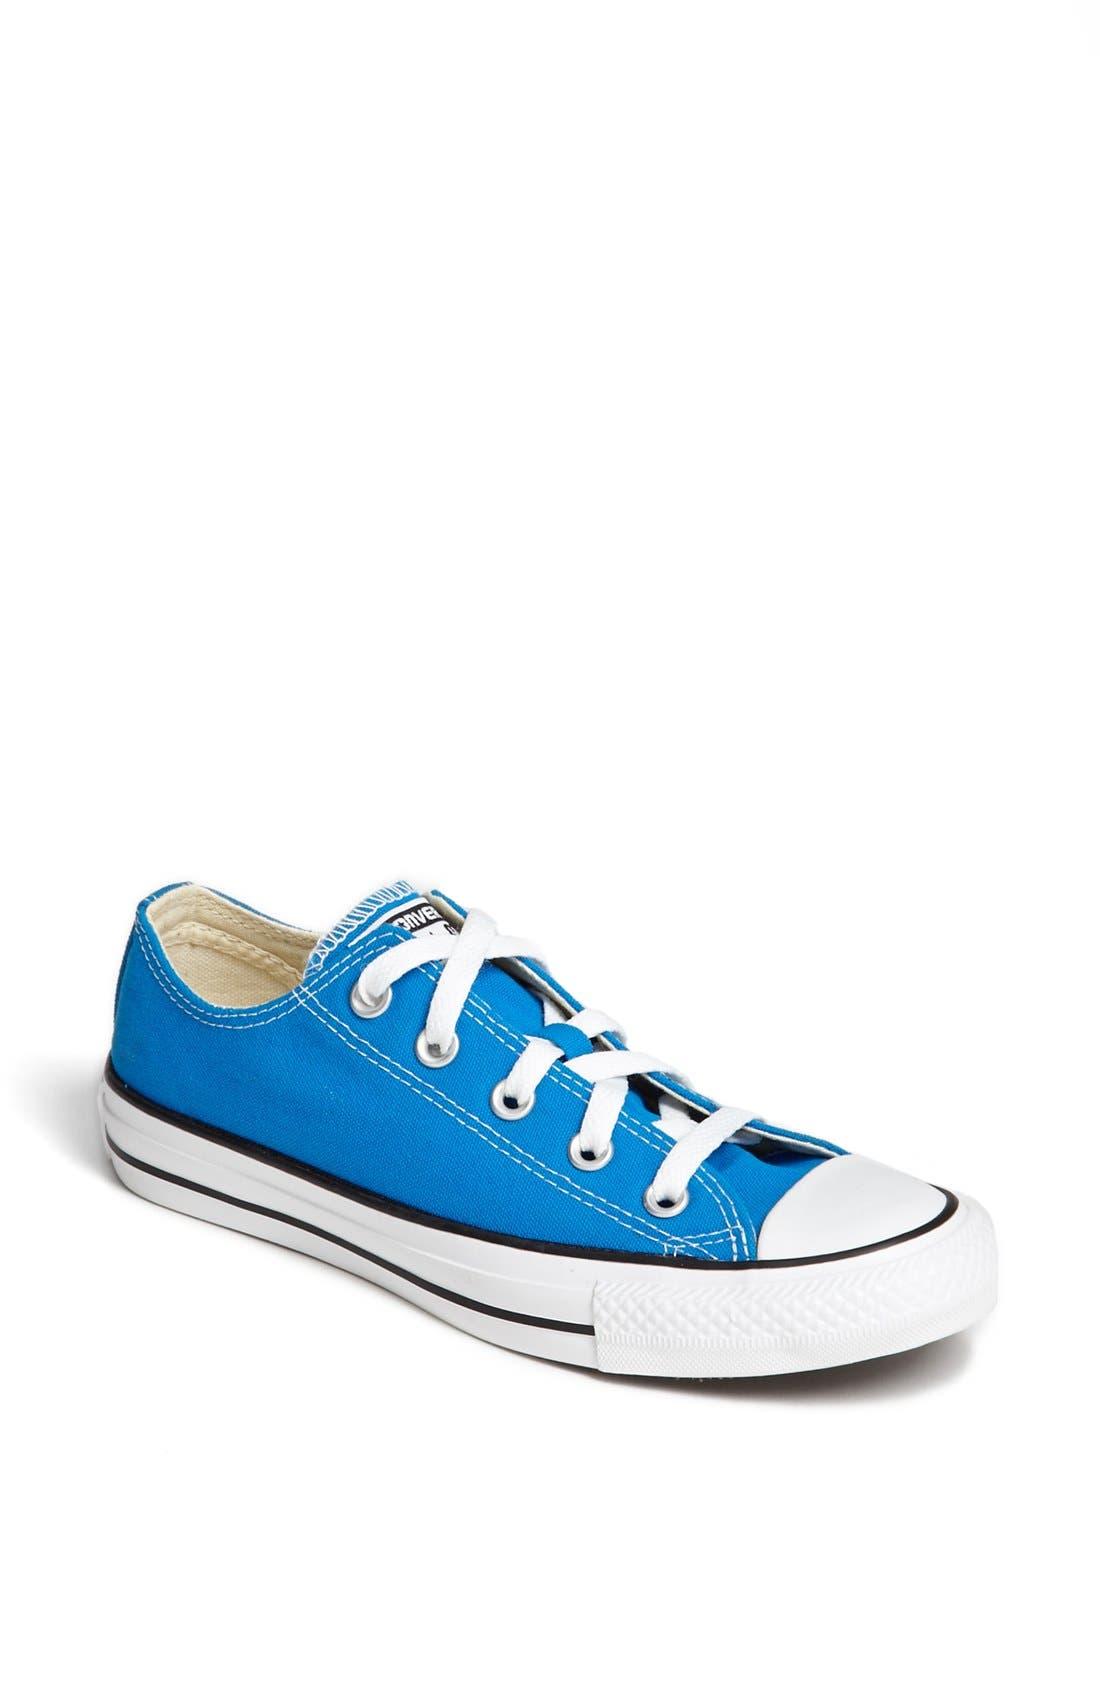 Main Image - Converse Chuck Taylor® All Star® Low Sneaker (Women)